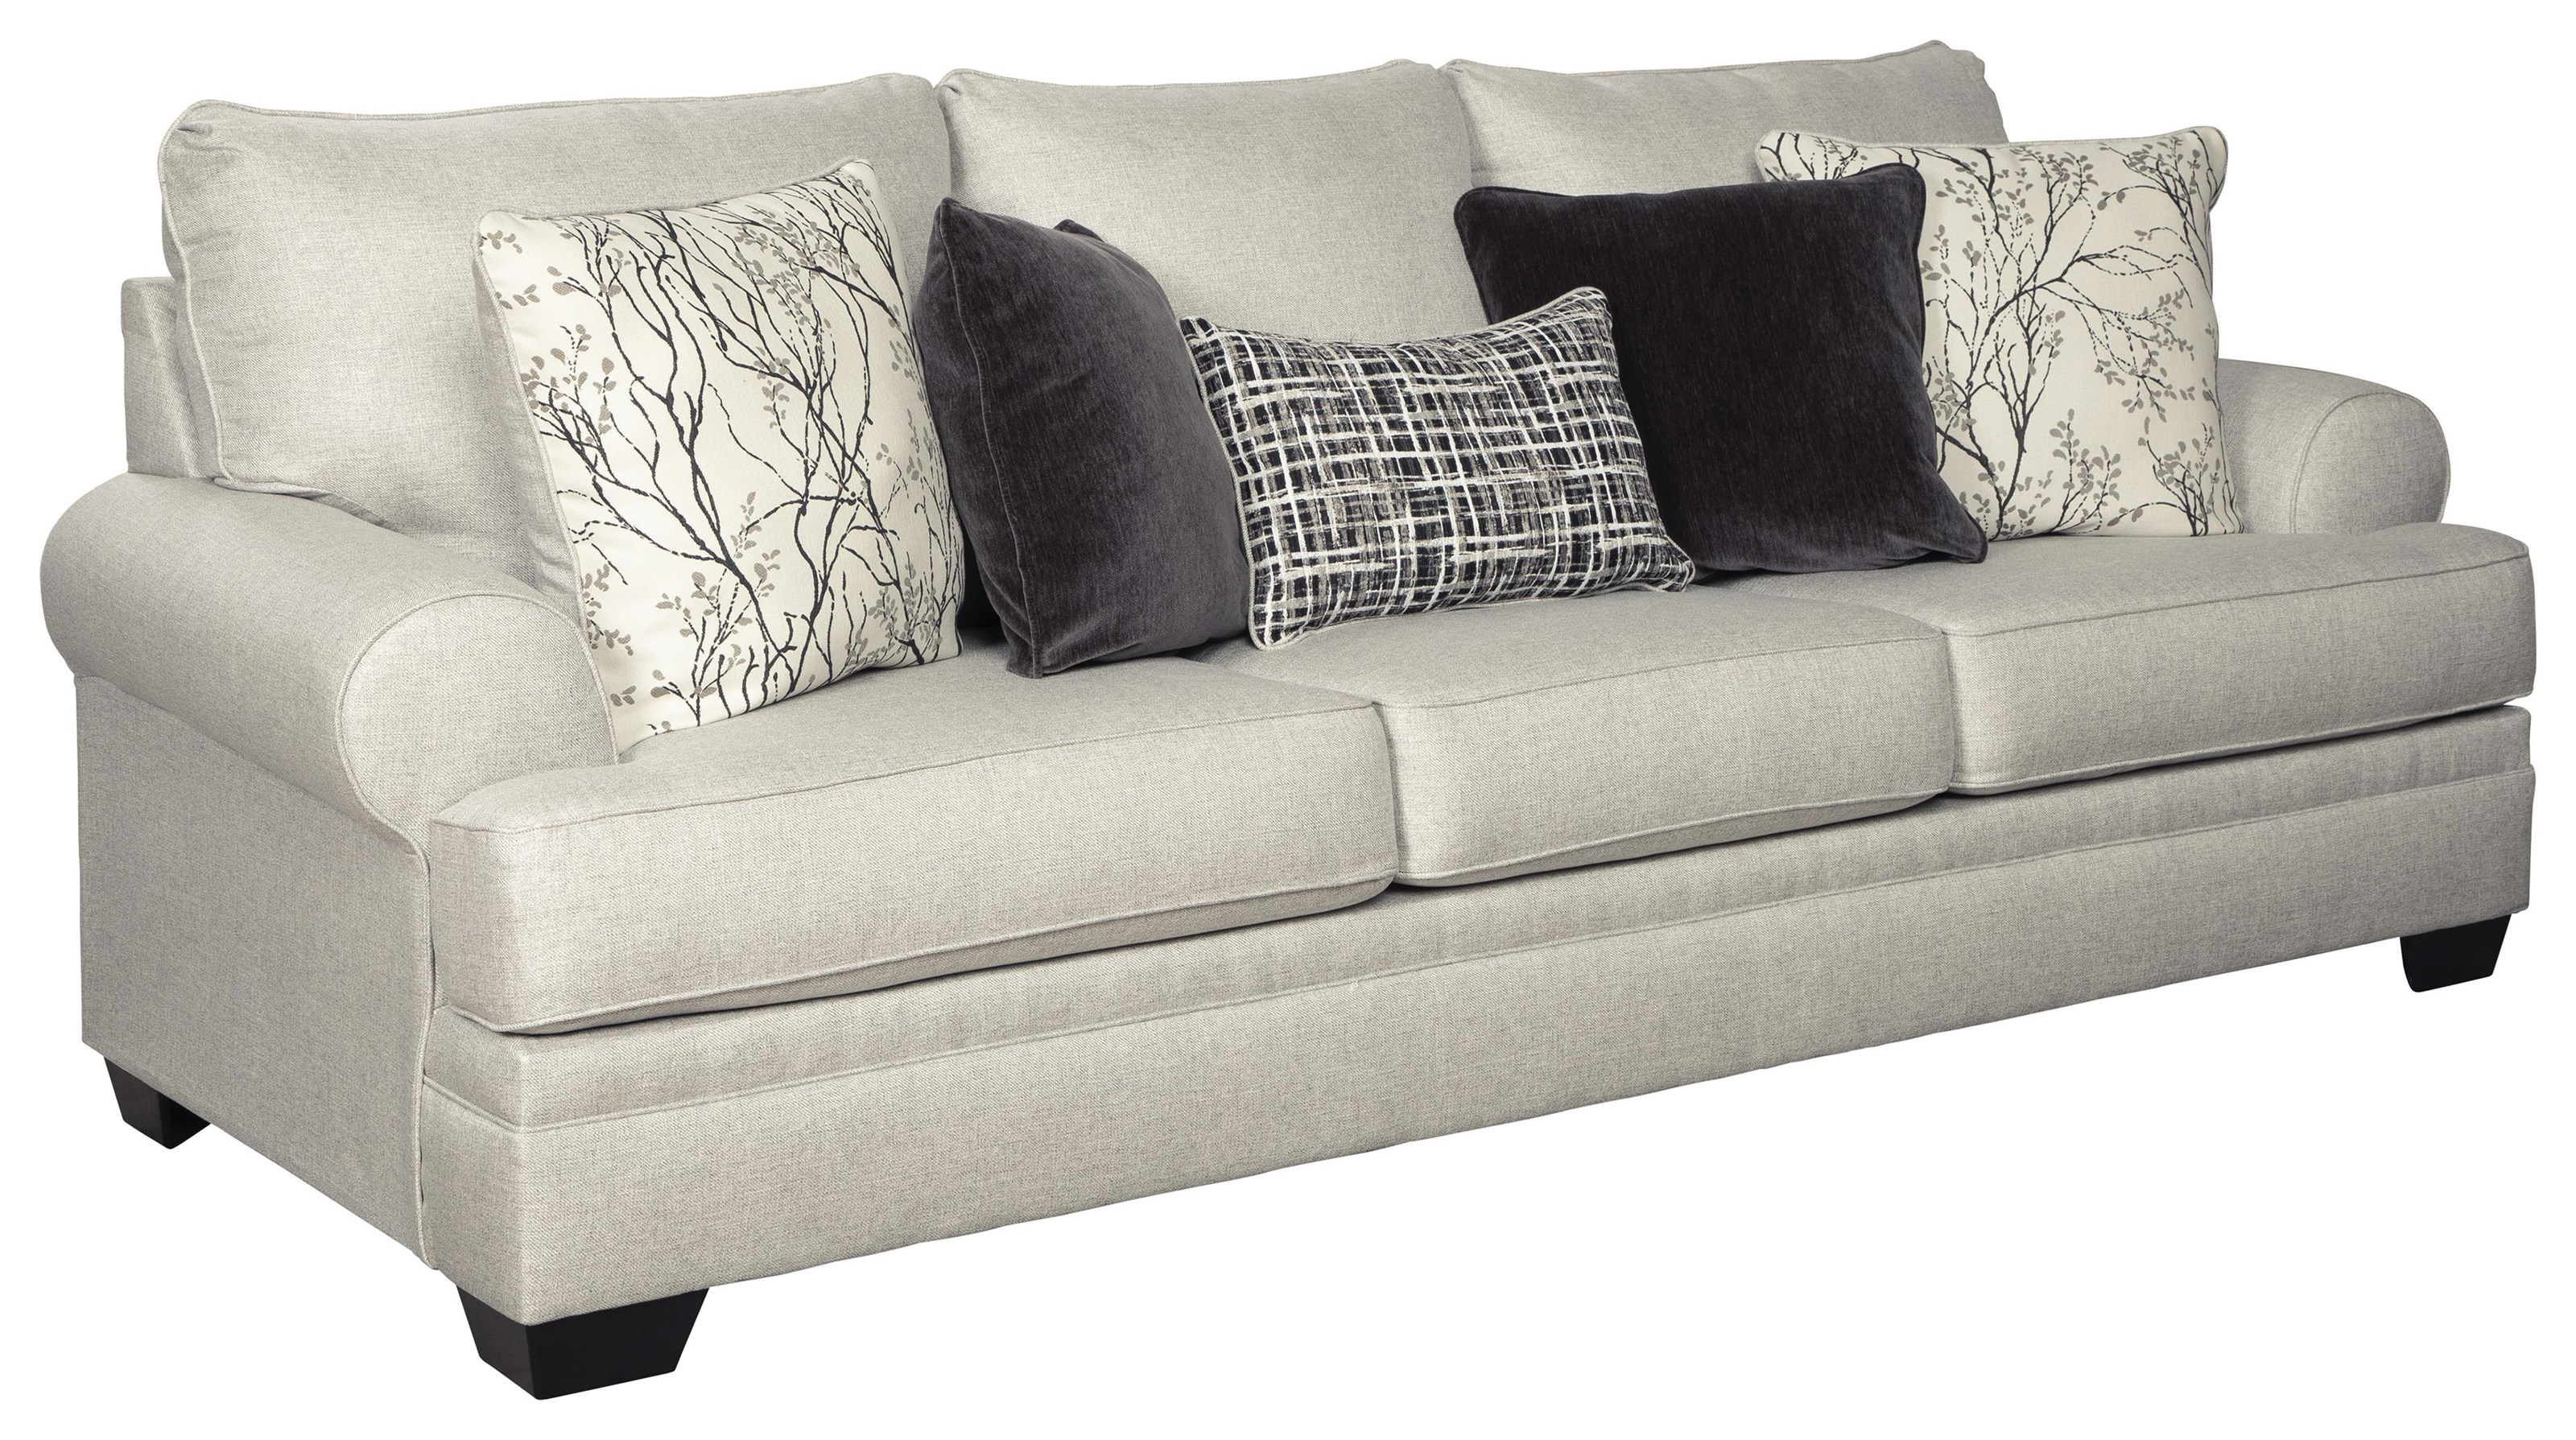 - Ashley Furniture Antonlini 2100139 Queen Sleeper Fog Sofa Sam